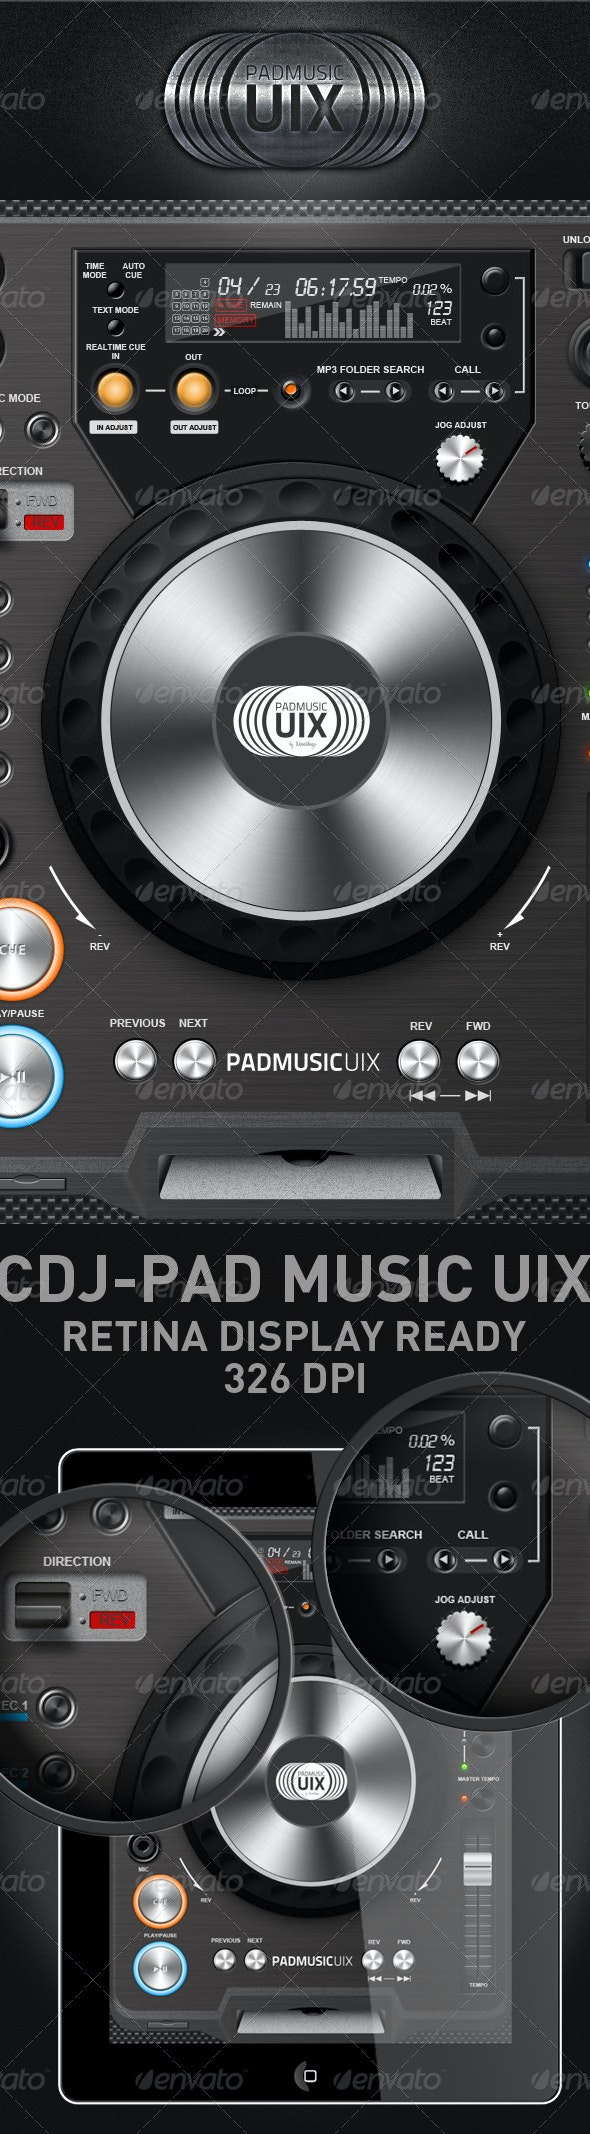 CDJ-Padmusicuix - Miscellaneous Graphics